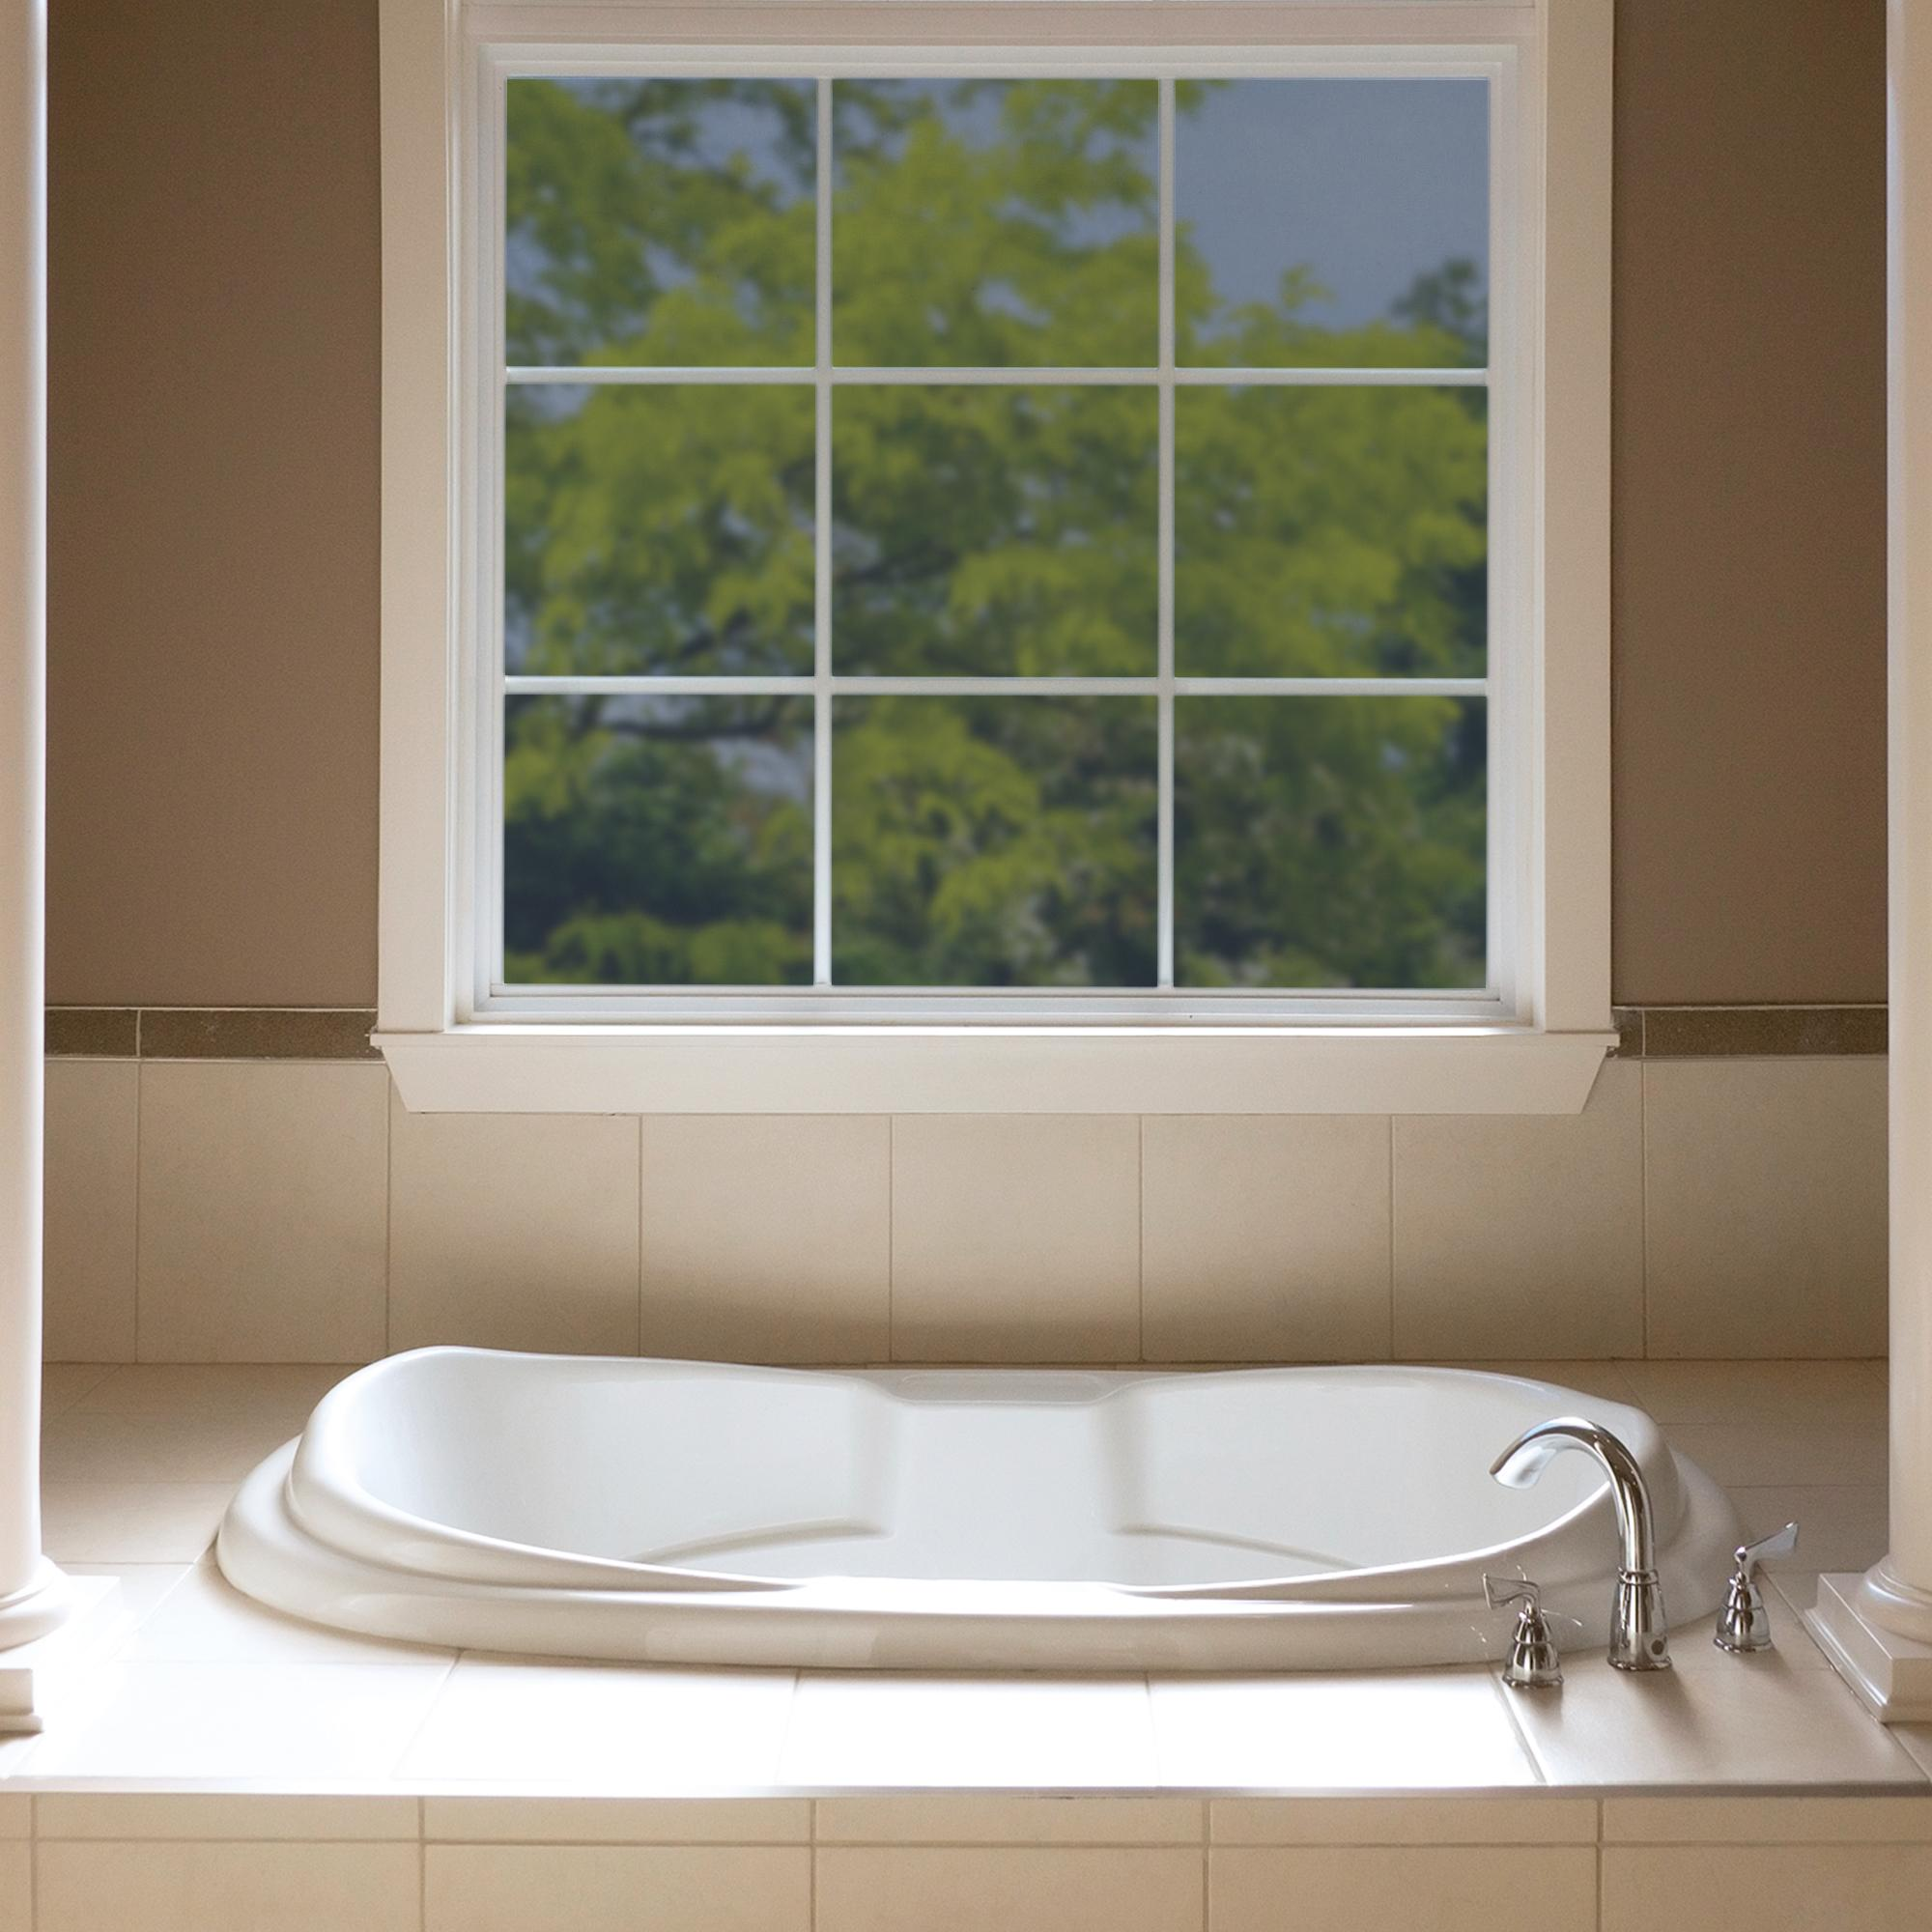 Do It Yourself Home Design: Amazon.com: Gila PRS361 Daytime Privacy Window Film, 36